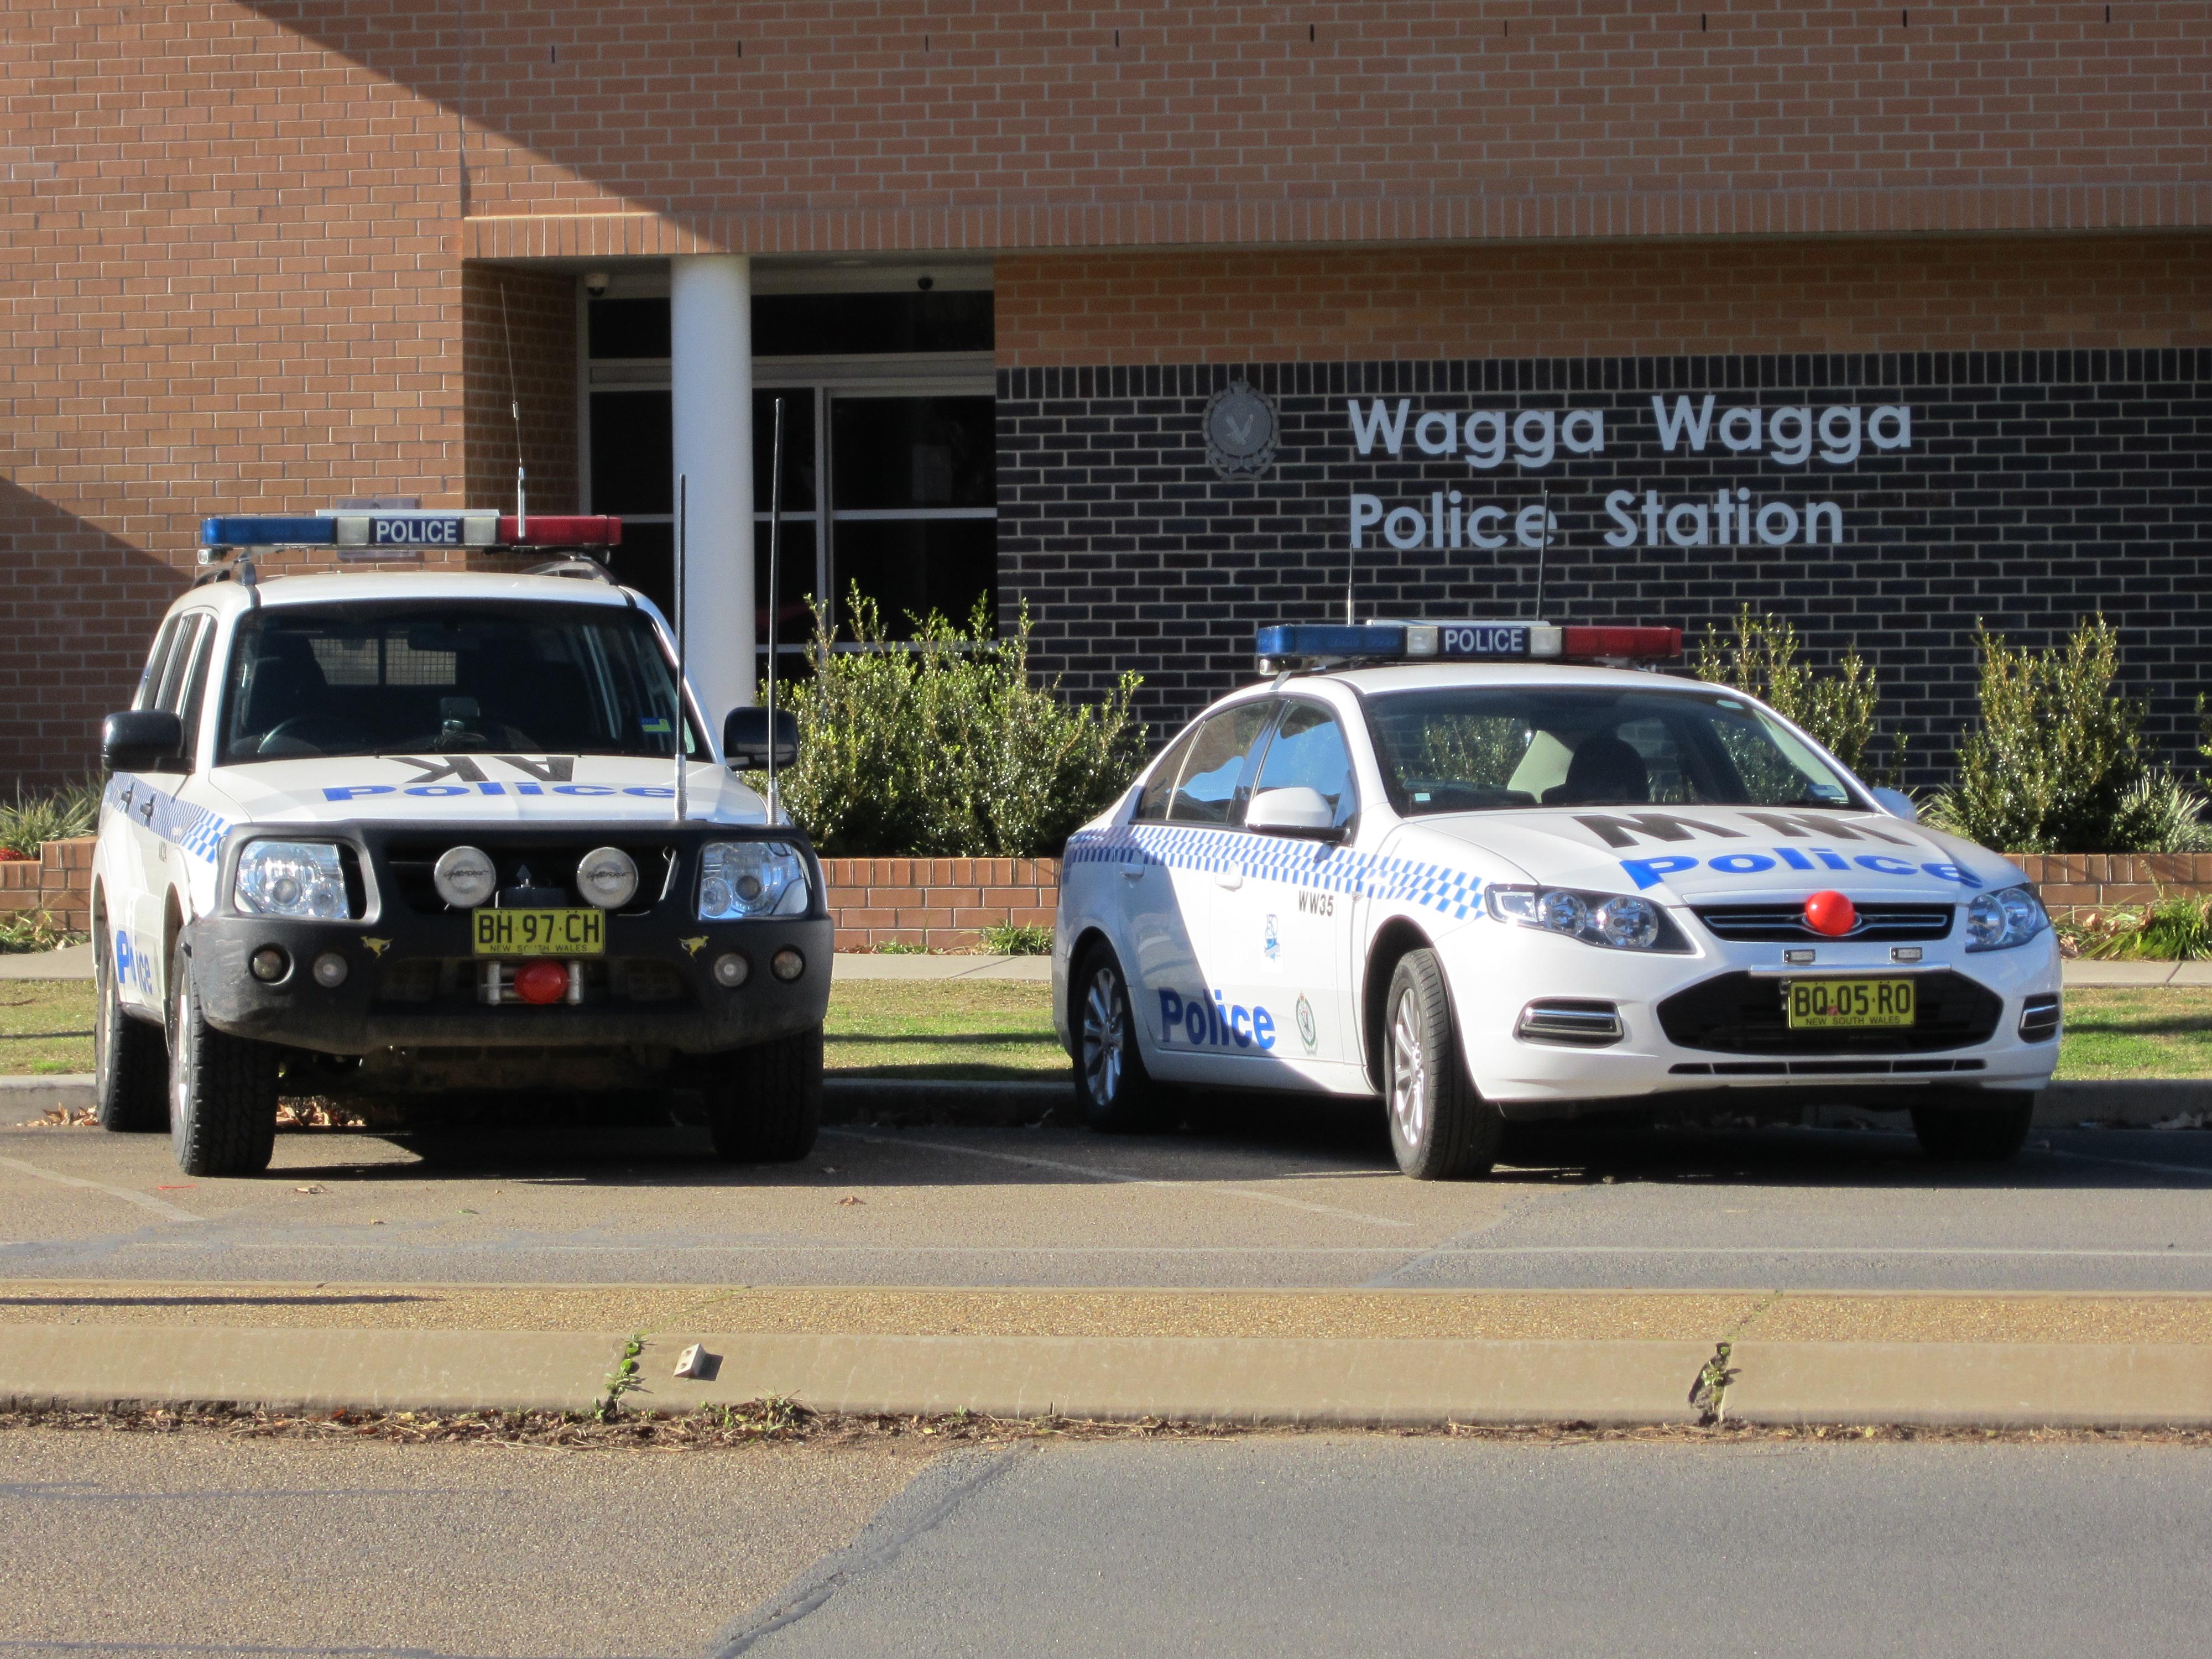 File:Ariah Park (AK47) Mitsubishi Pajero and Wagga Wagga (WW35) Ford